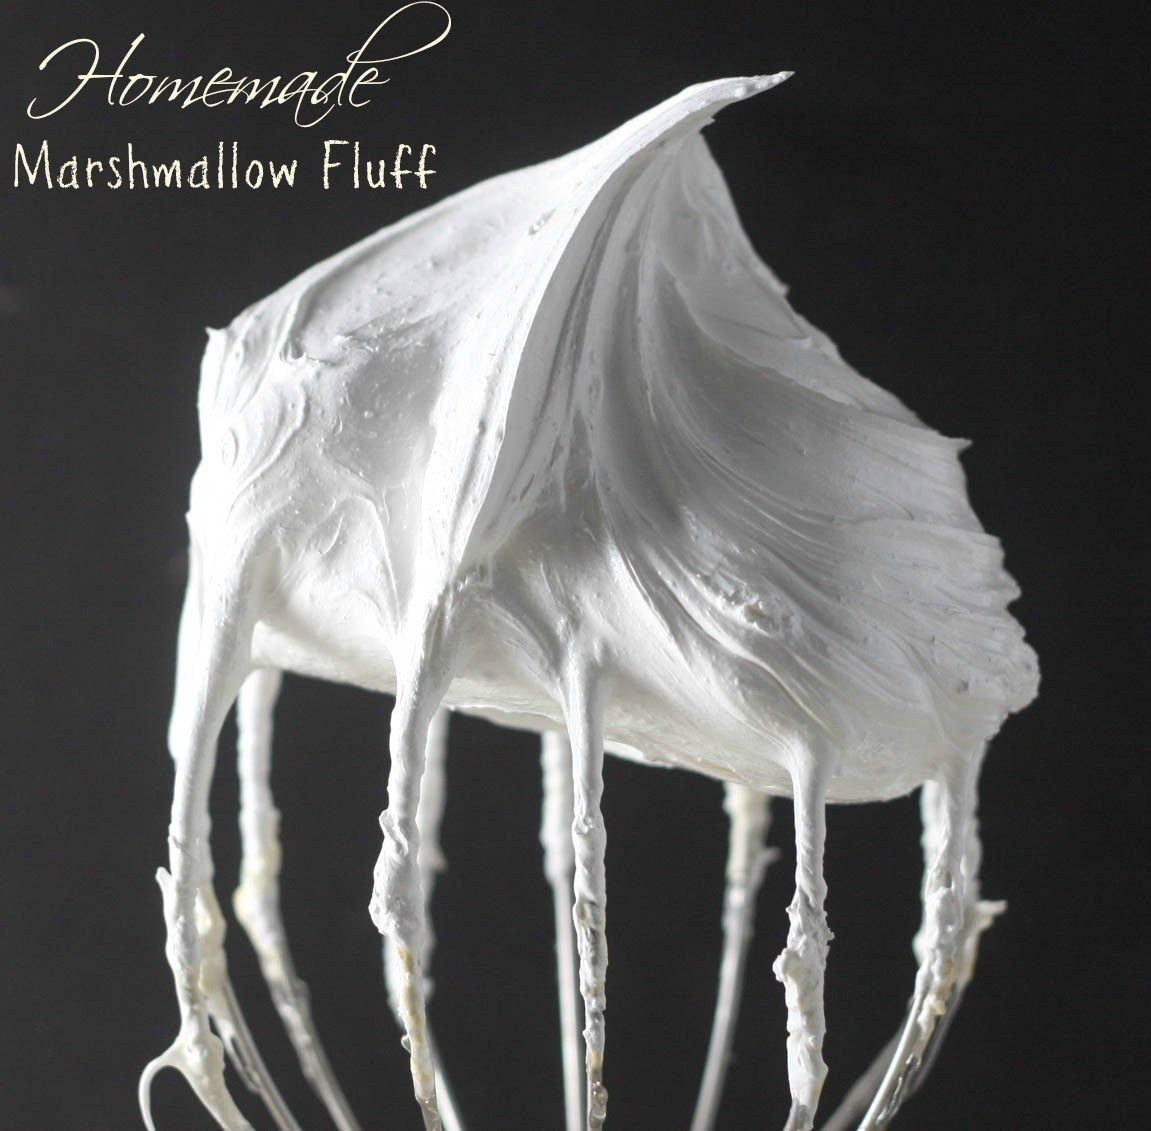 Homemade Marshmallow Fluff #marshmallowflufffrosting